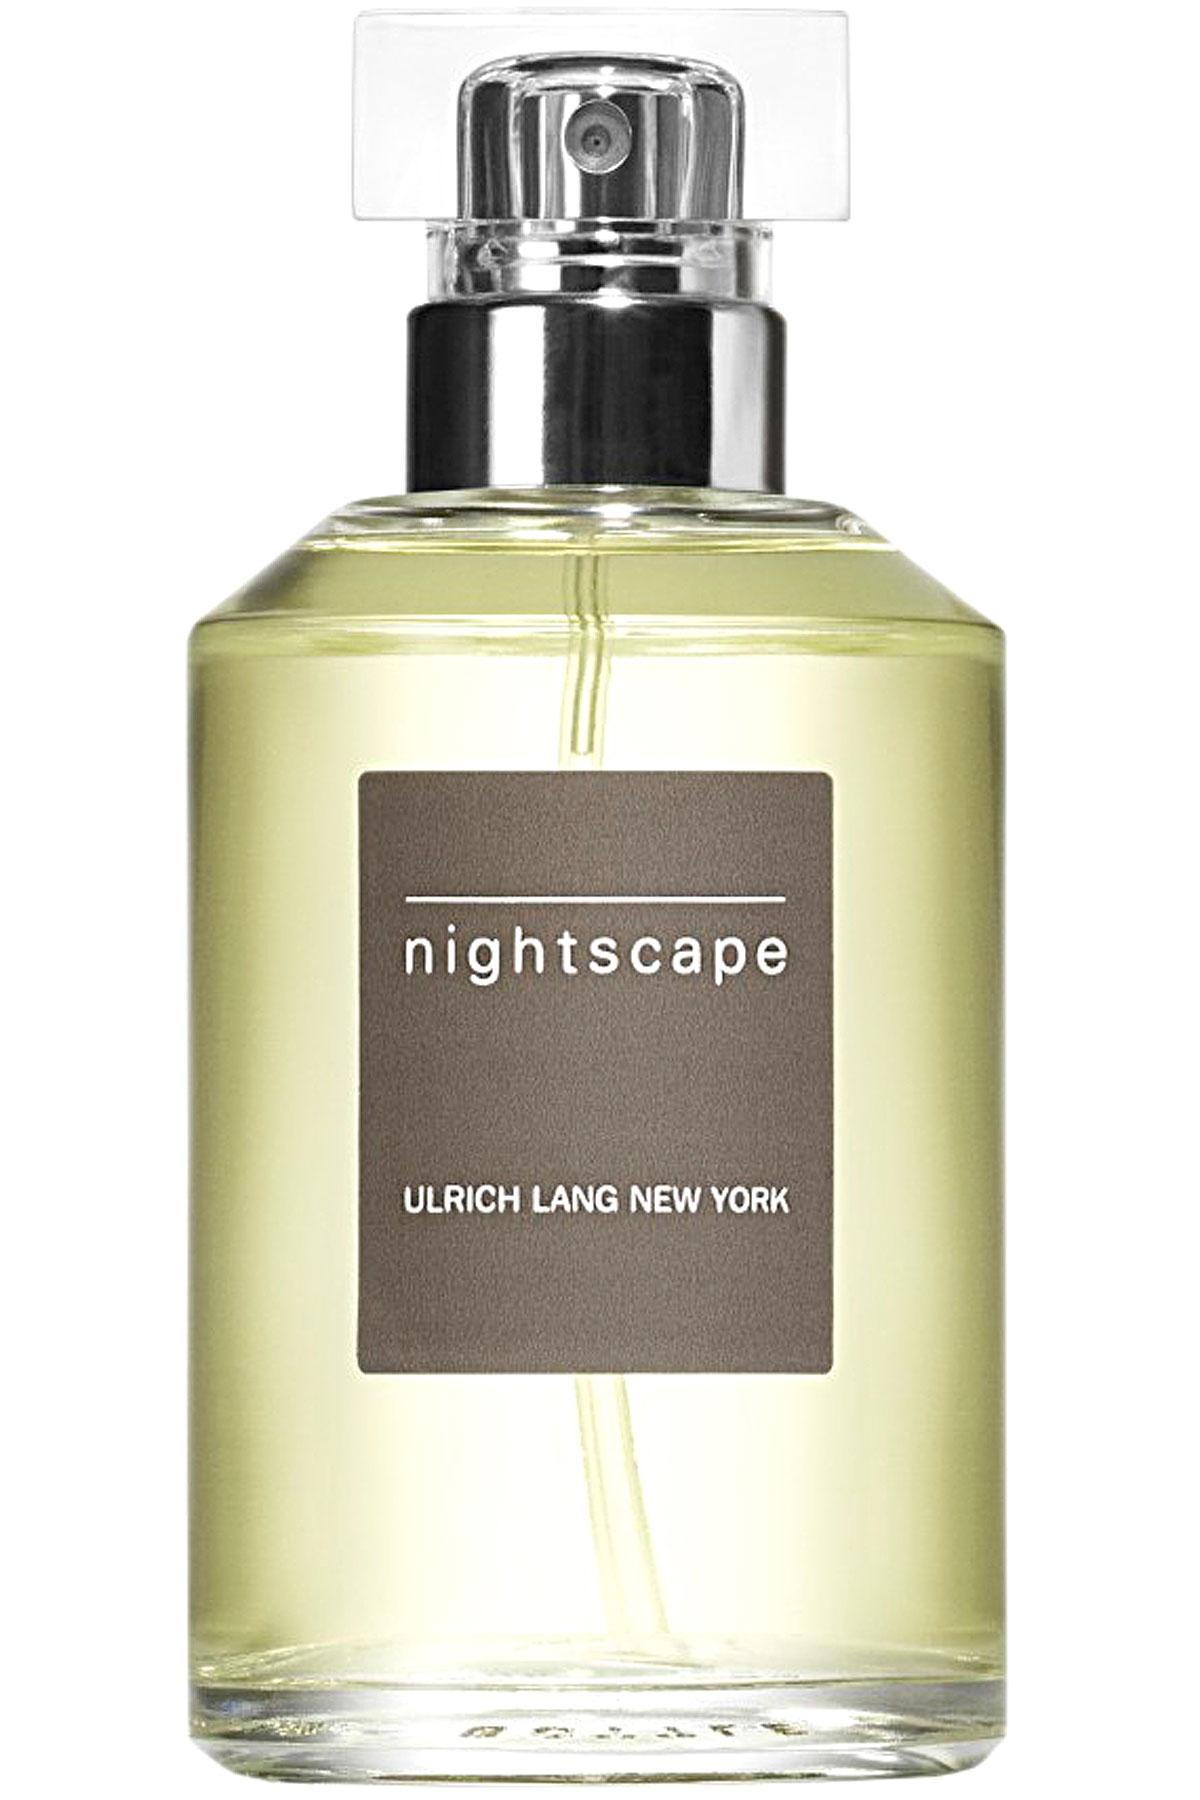 Ulrich Lang New York Womens Fragrances On Sale, Nightscape - Eau De Toilette - 100 Ml, 2019, 100 ml